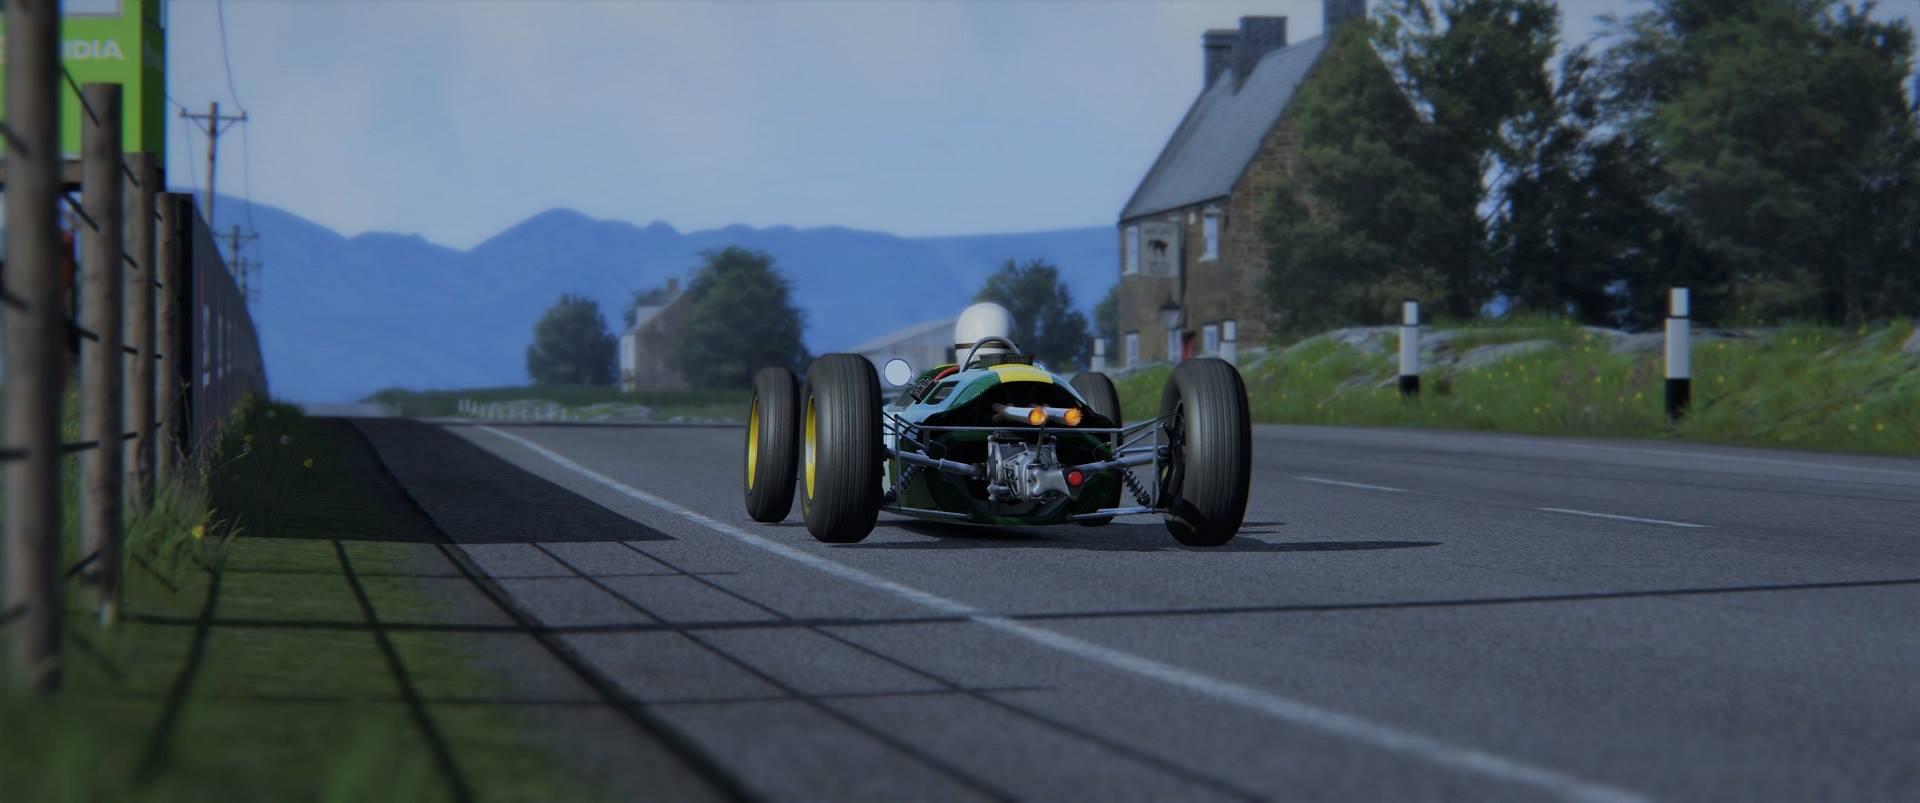 Assetto Corsa Highlands Track 2.jpg